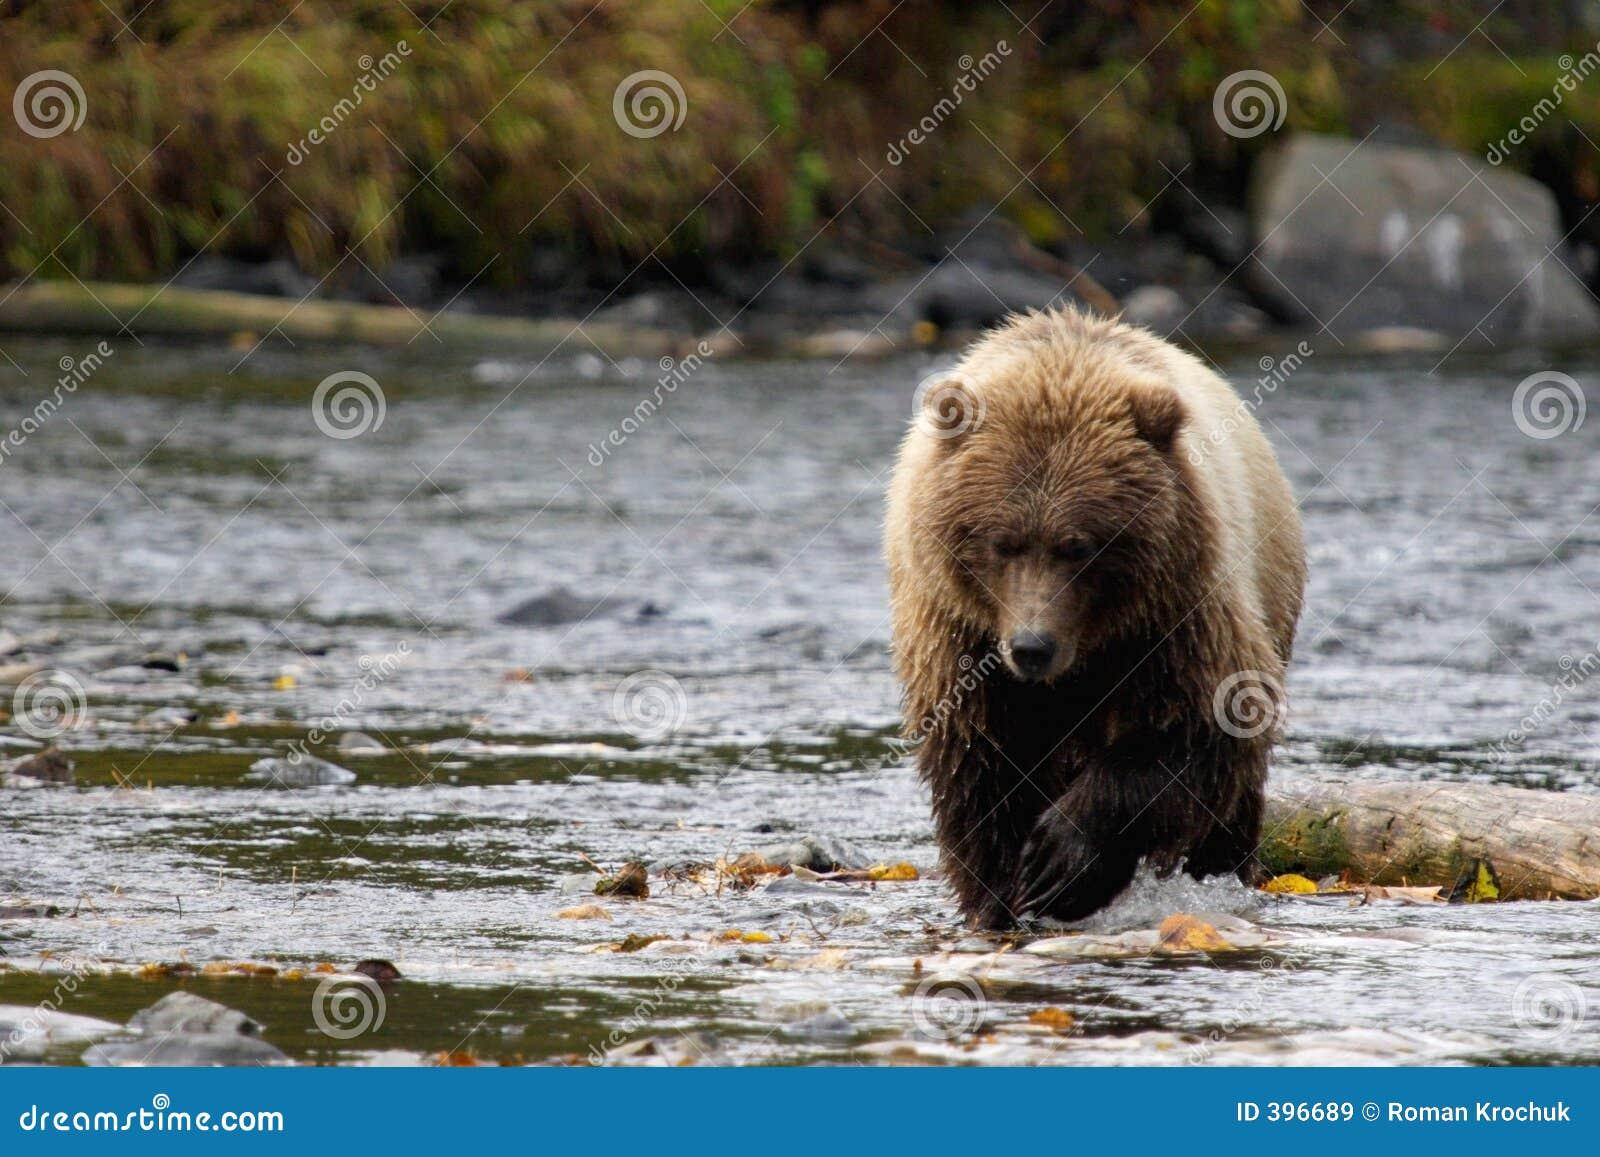 Bear coming heads up